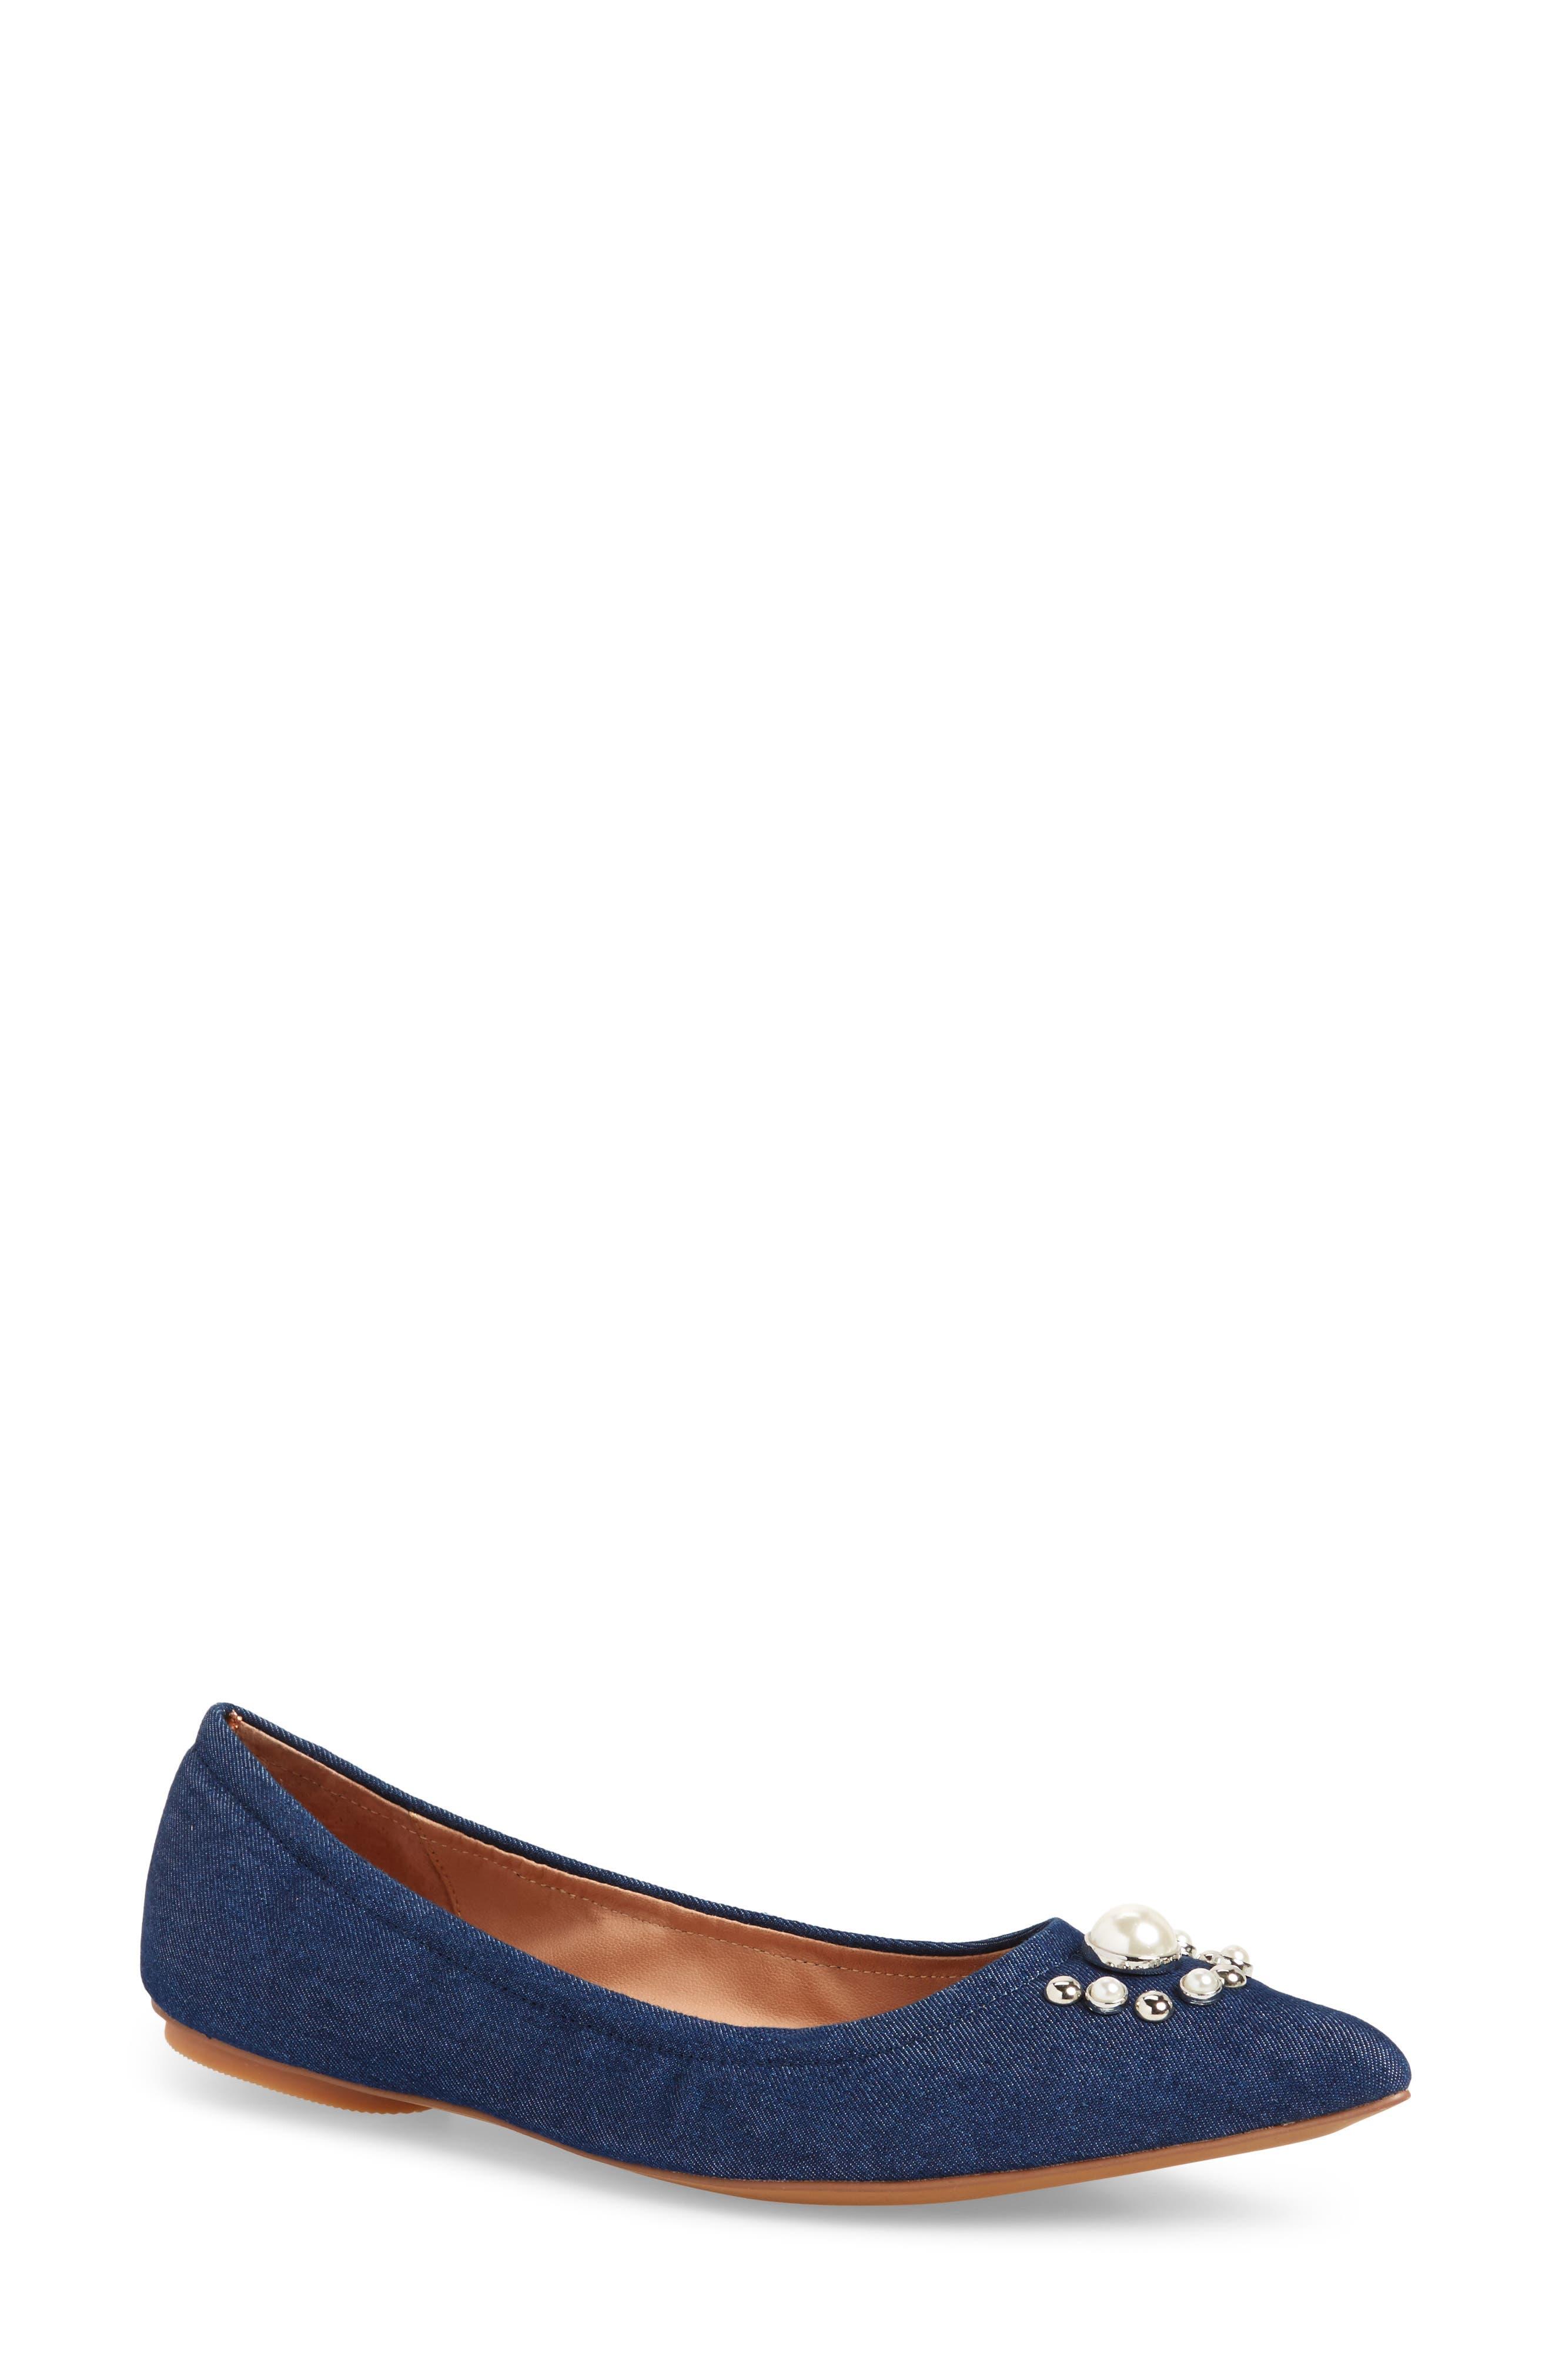 Nadia Embellished Pointy Toe Flat,                         Main,                         color, NAVY DENIM FABRIC